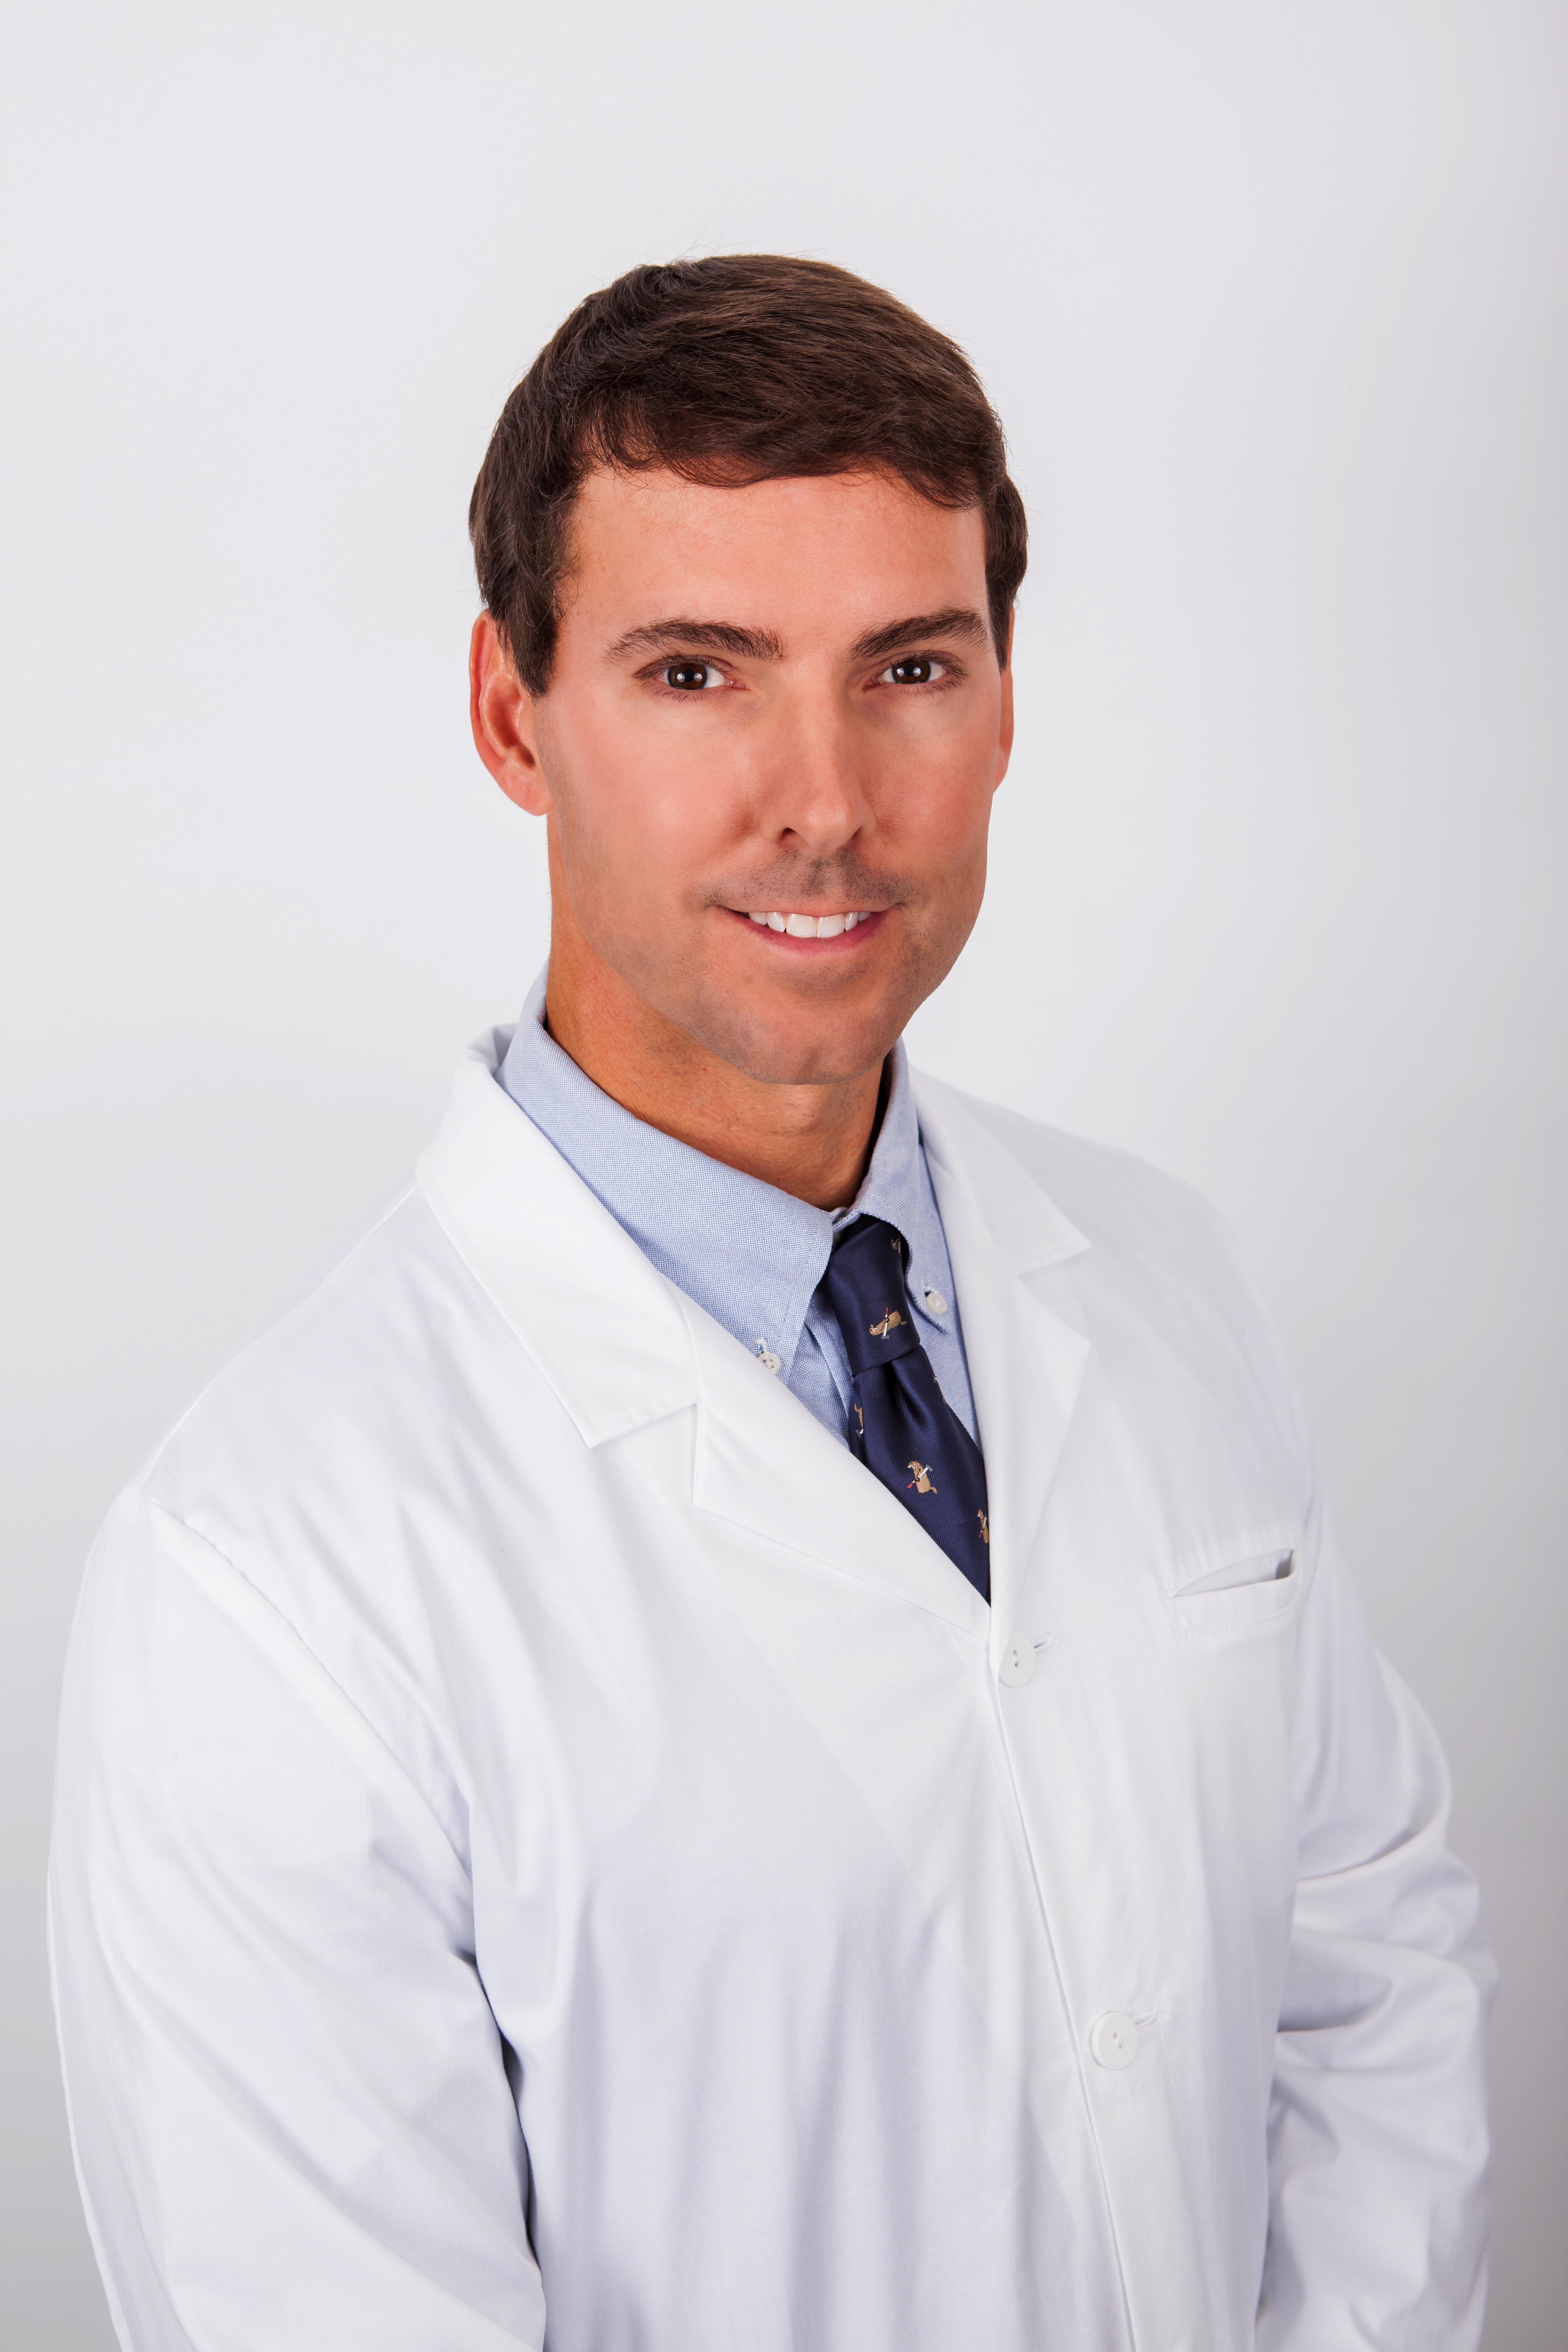 Michael A. Stickler, MD